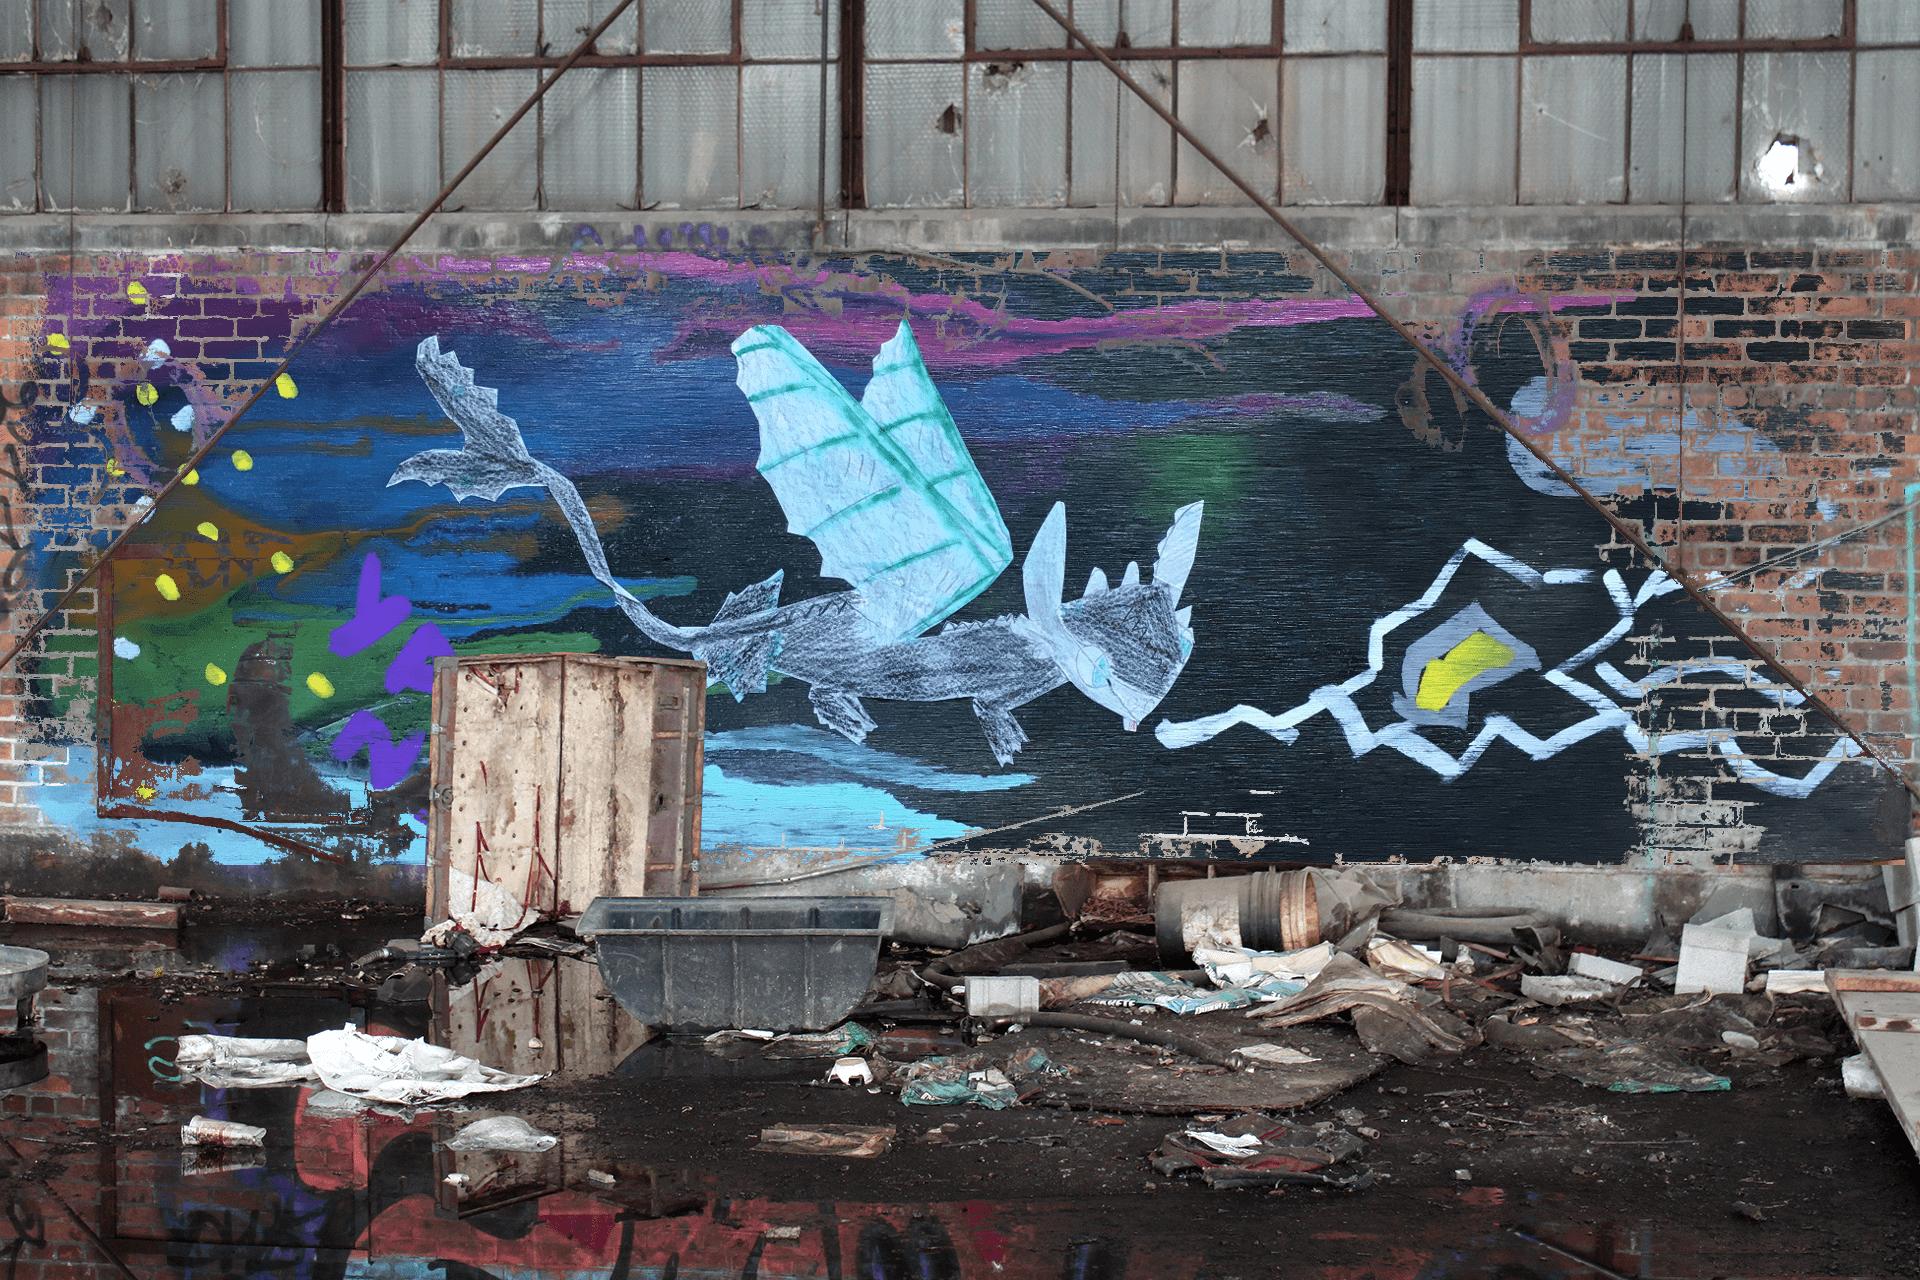 Location: https://www.snakeoilmagazine.com/swan-graffiti-piece/